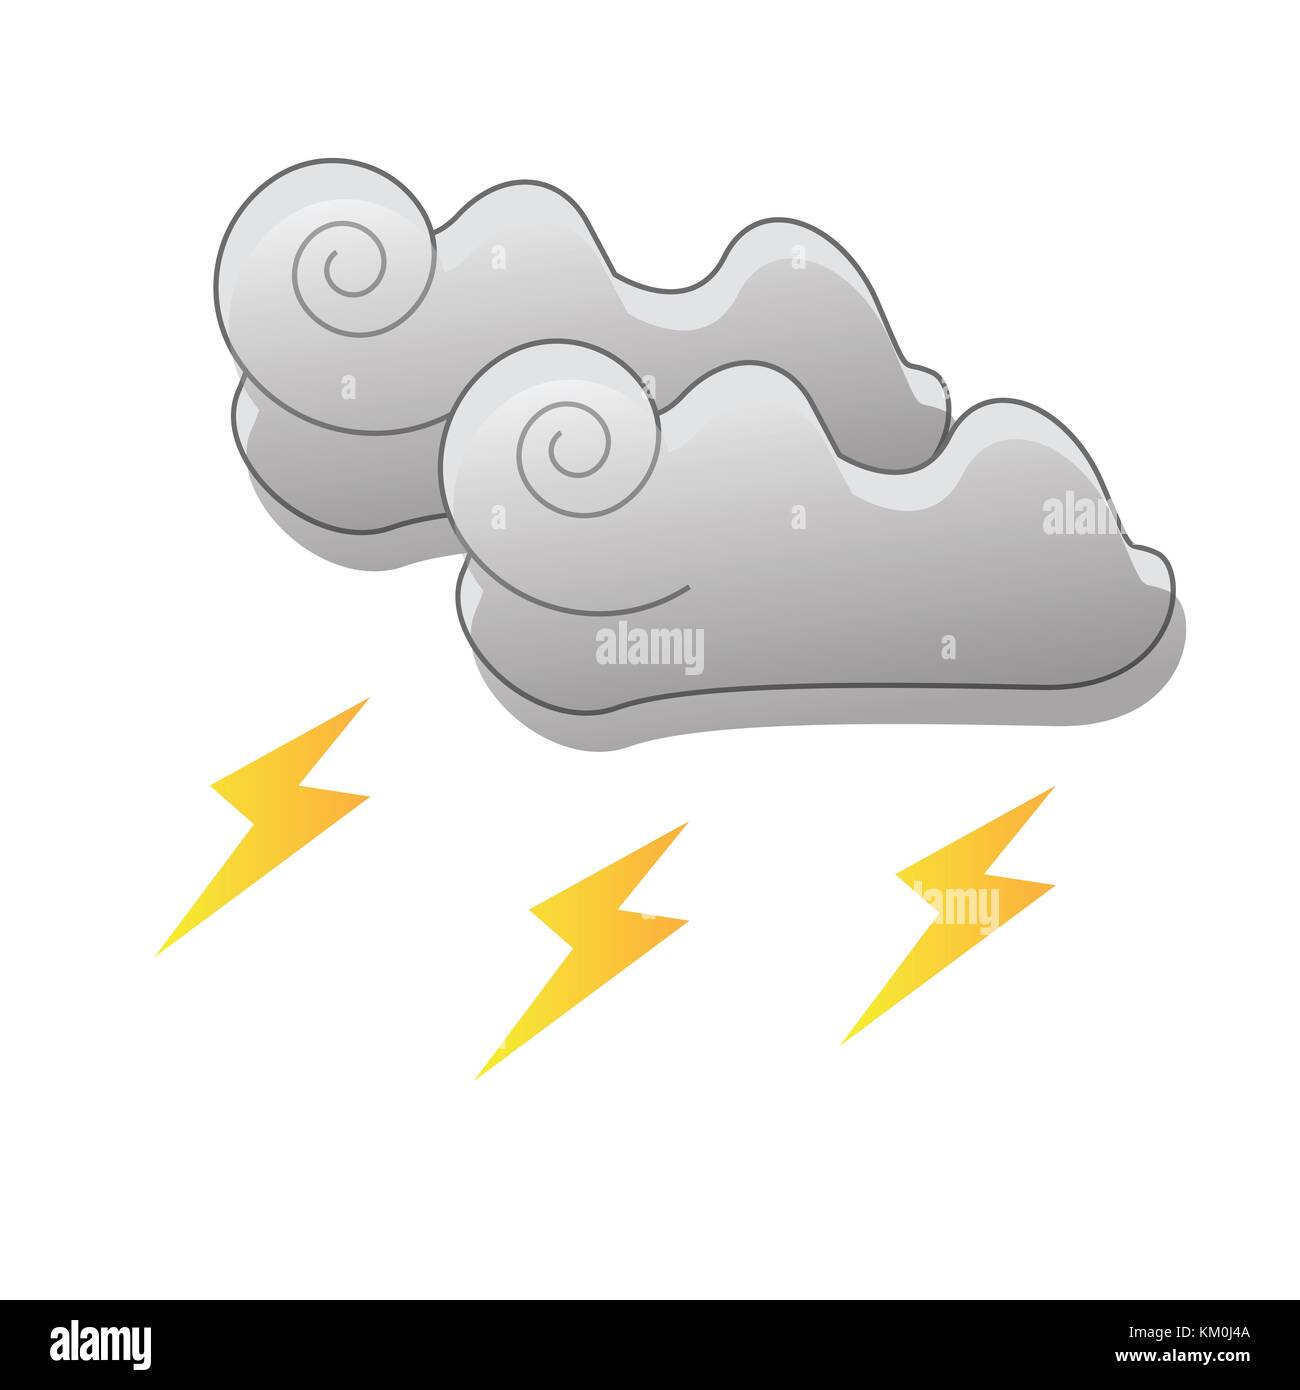 weather icons - Stock Image